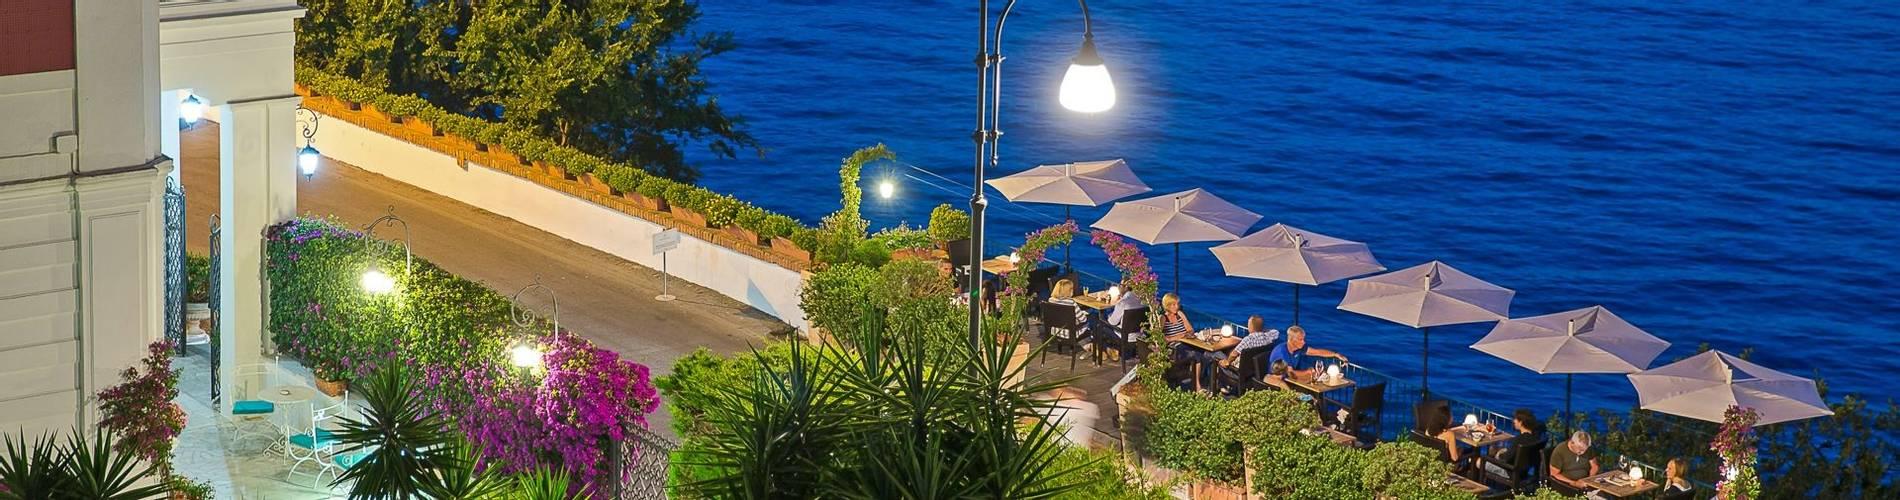 Villa Garden, Amalfi, Italy (10).jpg